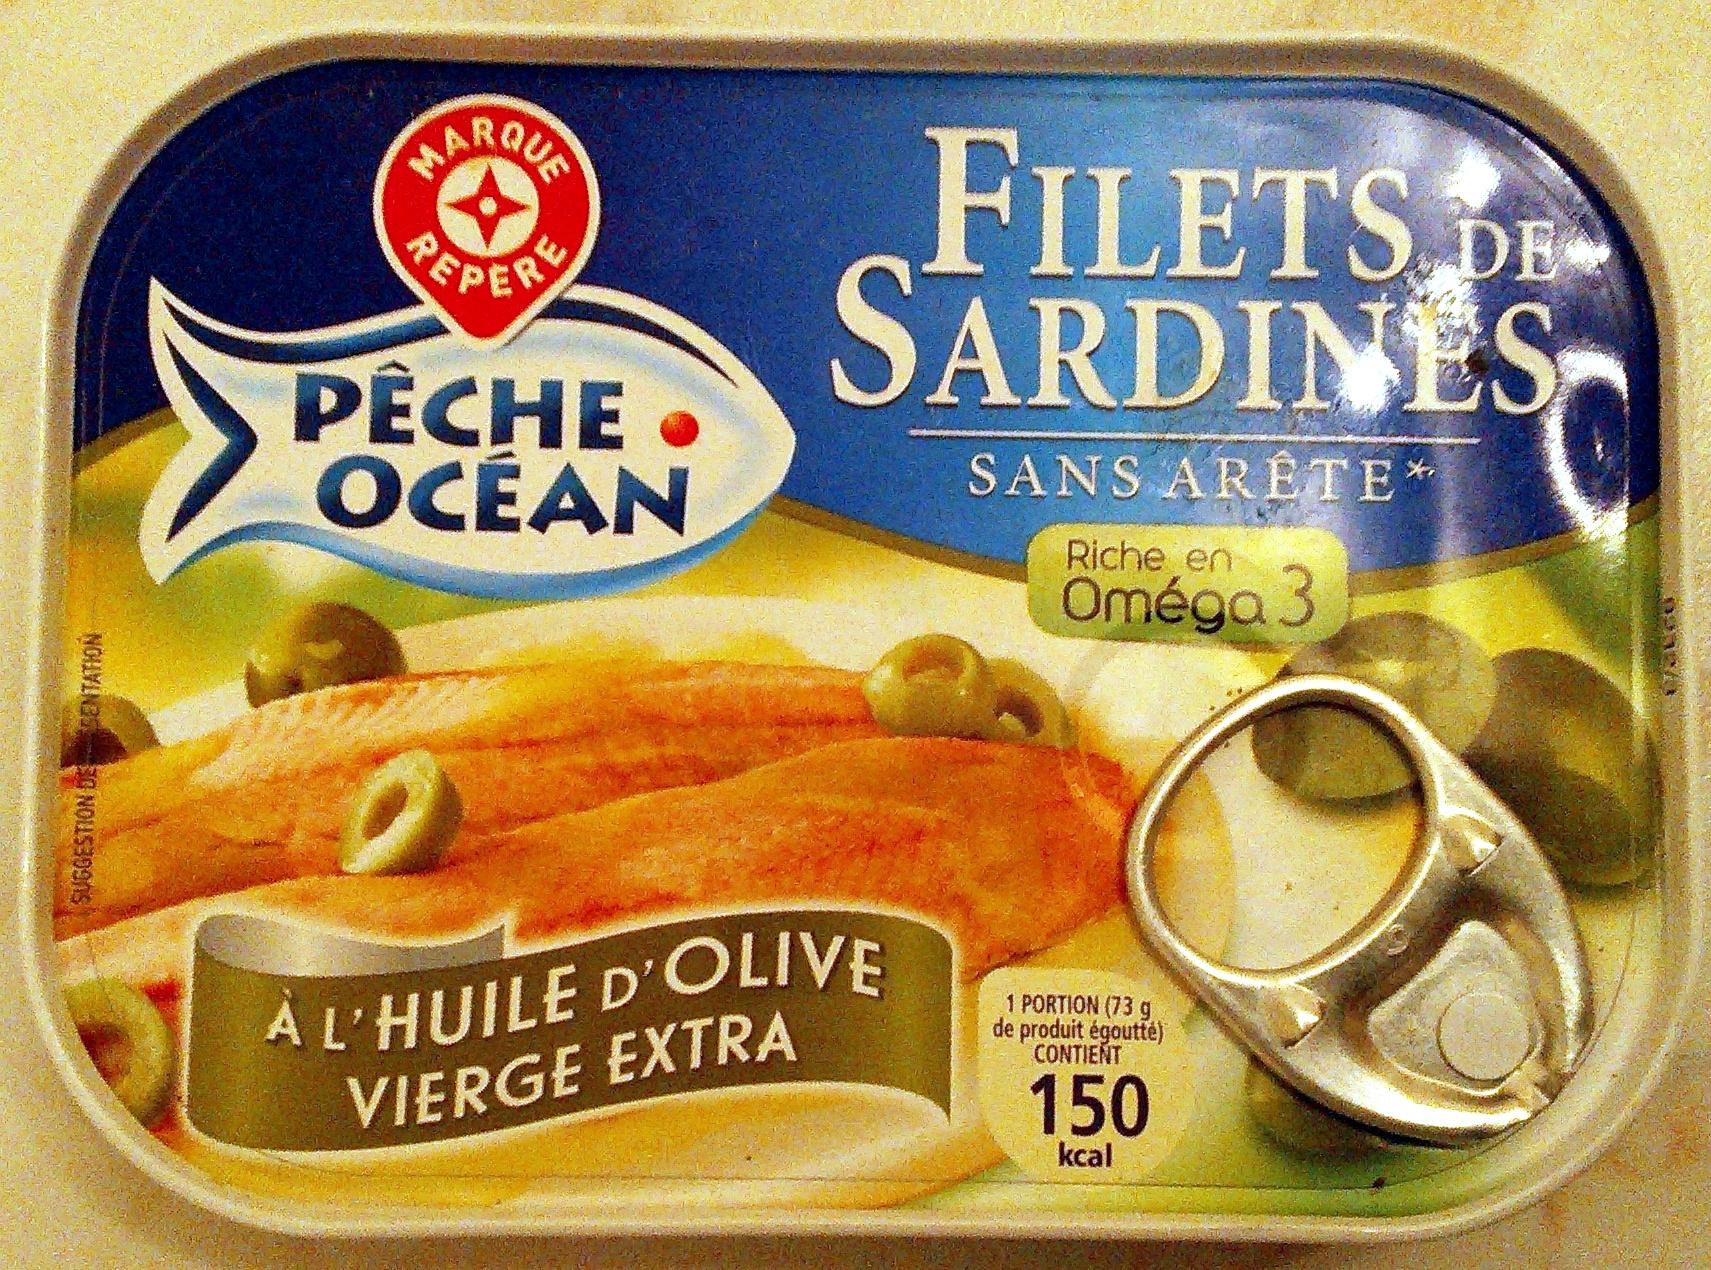 filets de sardines l 39 huile d 39 olive vierge extra p che. Black Bedroom Furniture Sets. Home Design Ideas